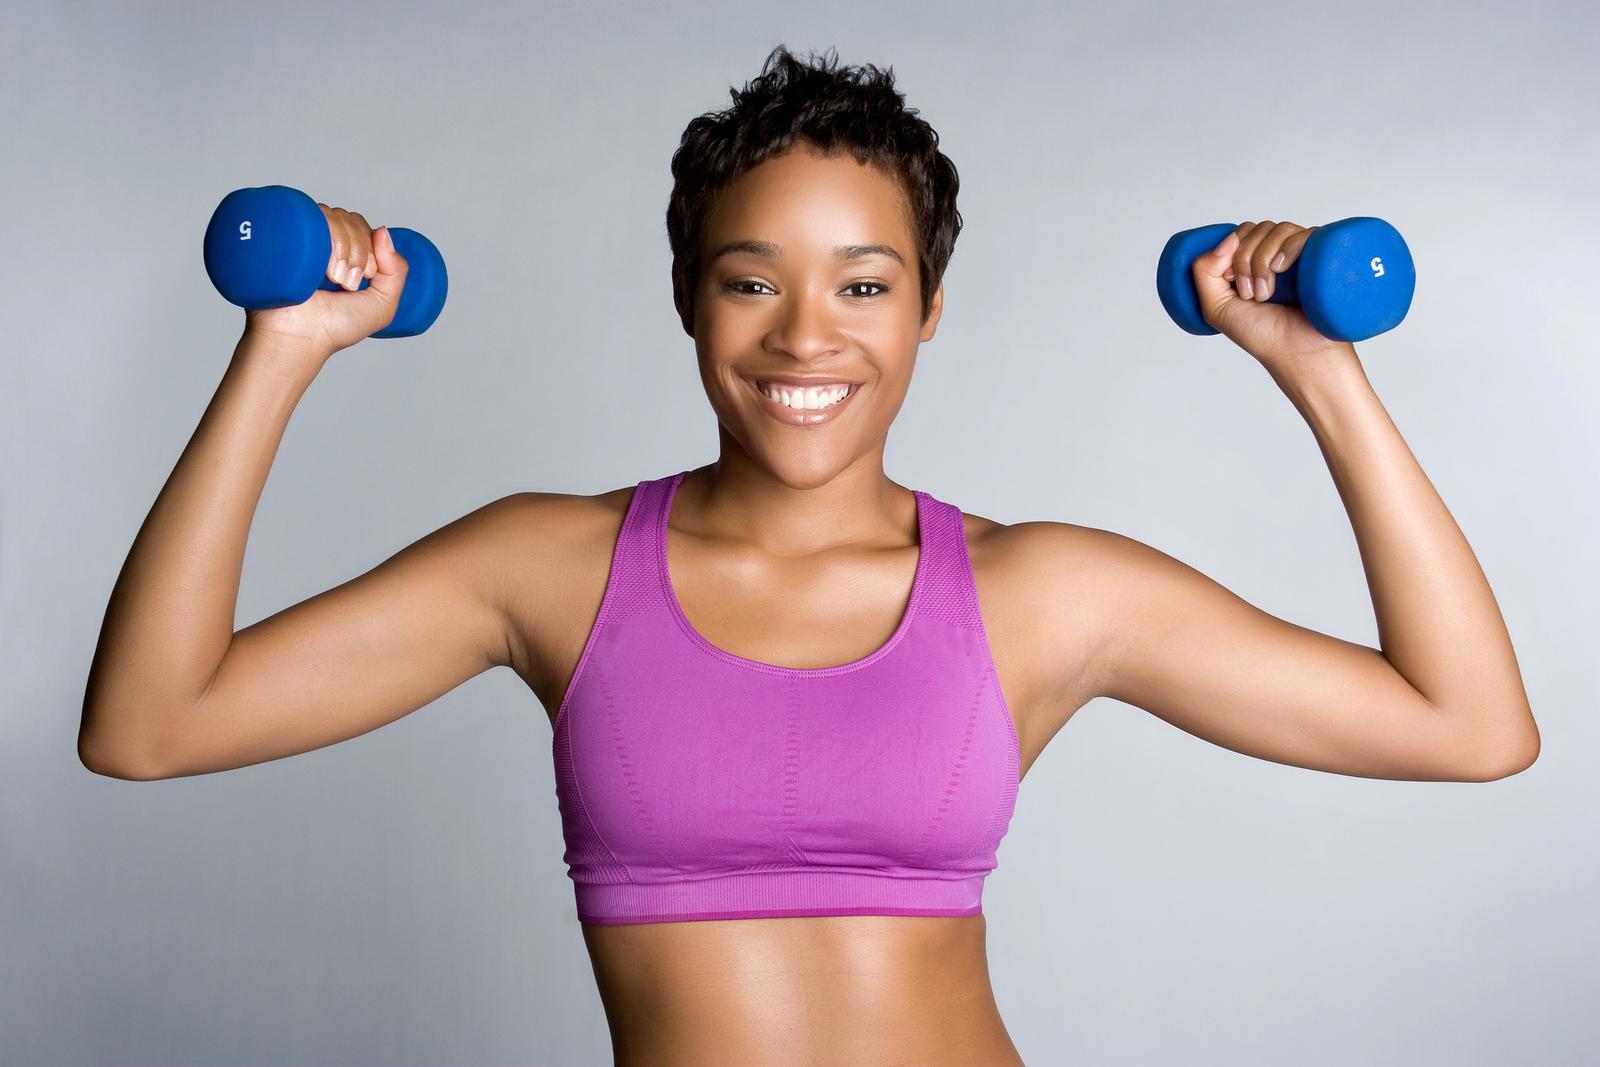 Article_3_Picure_2_bigstock-Black-Woman-Exercising-12039446